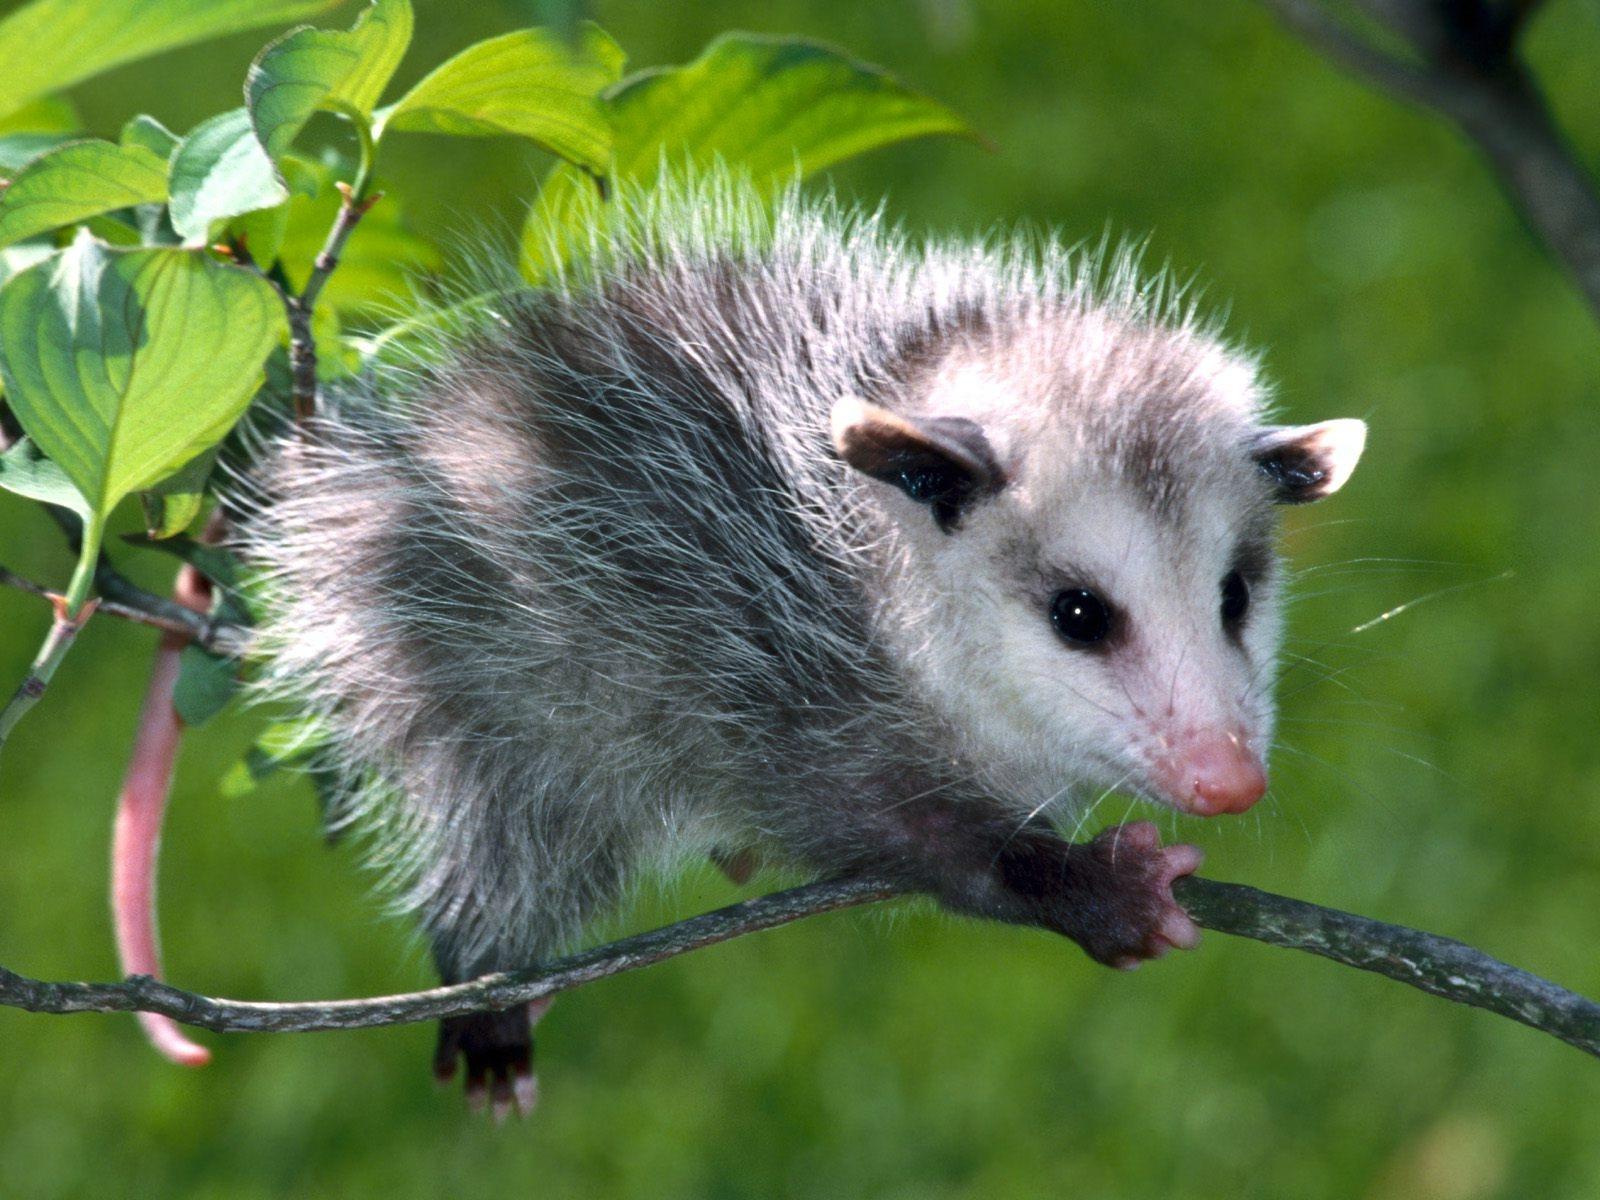 Opossum wallpapers HD